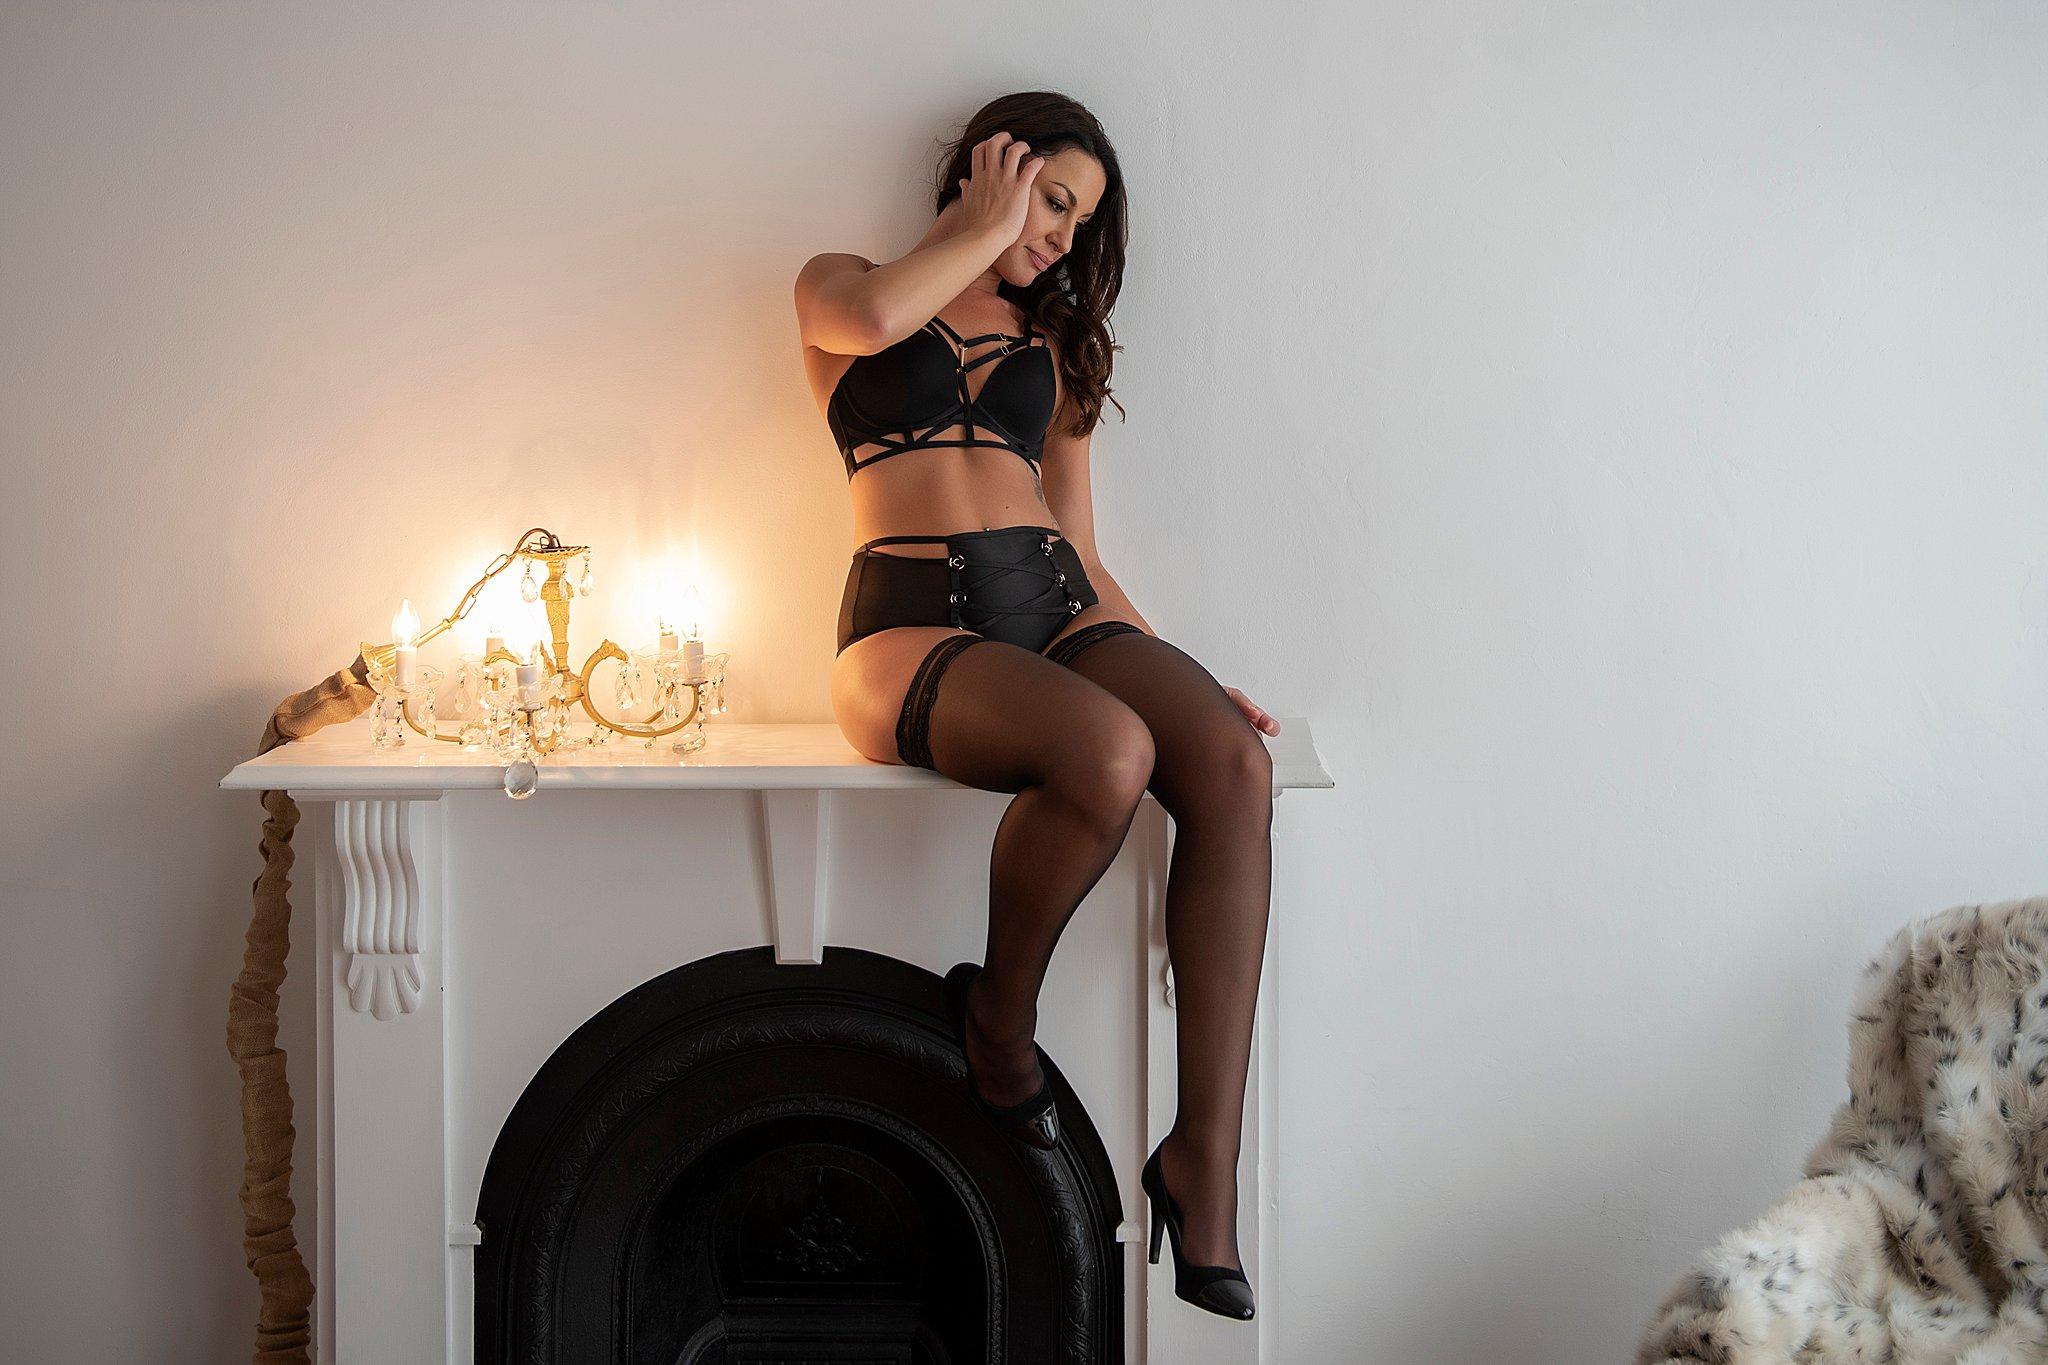 Intimate-boudoir-photoshoot-006.jpg